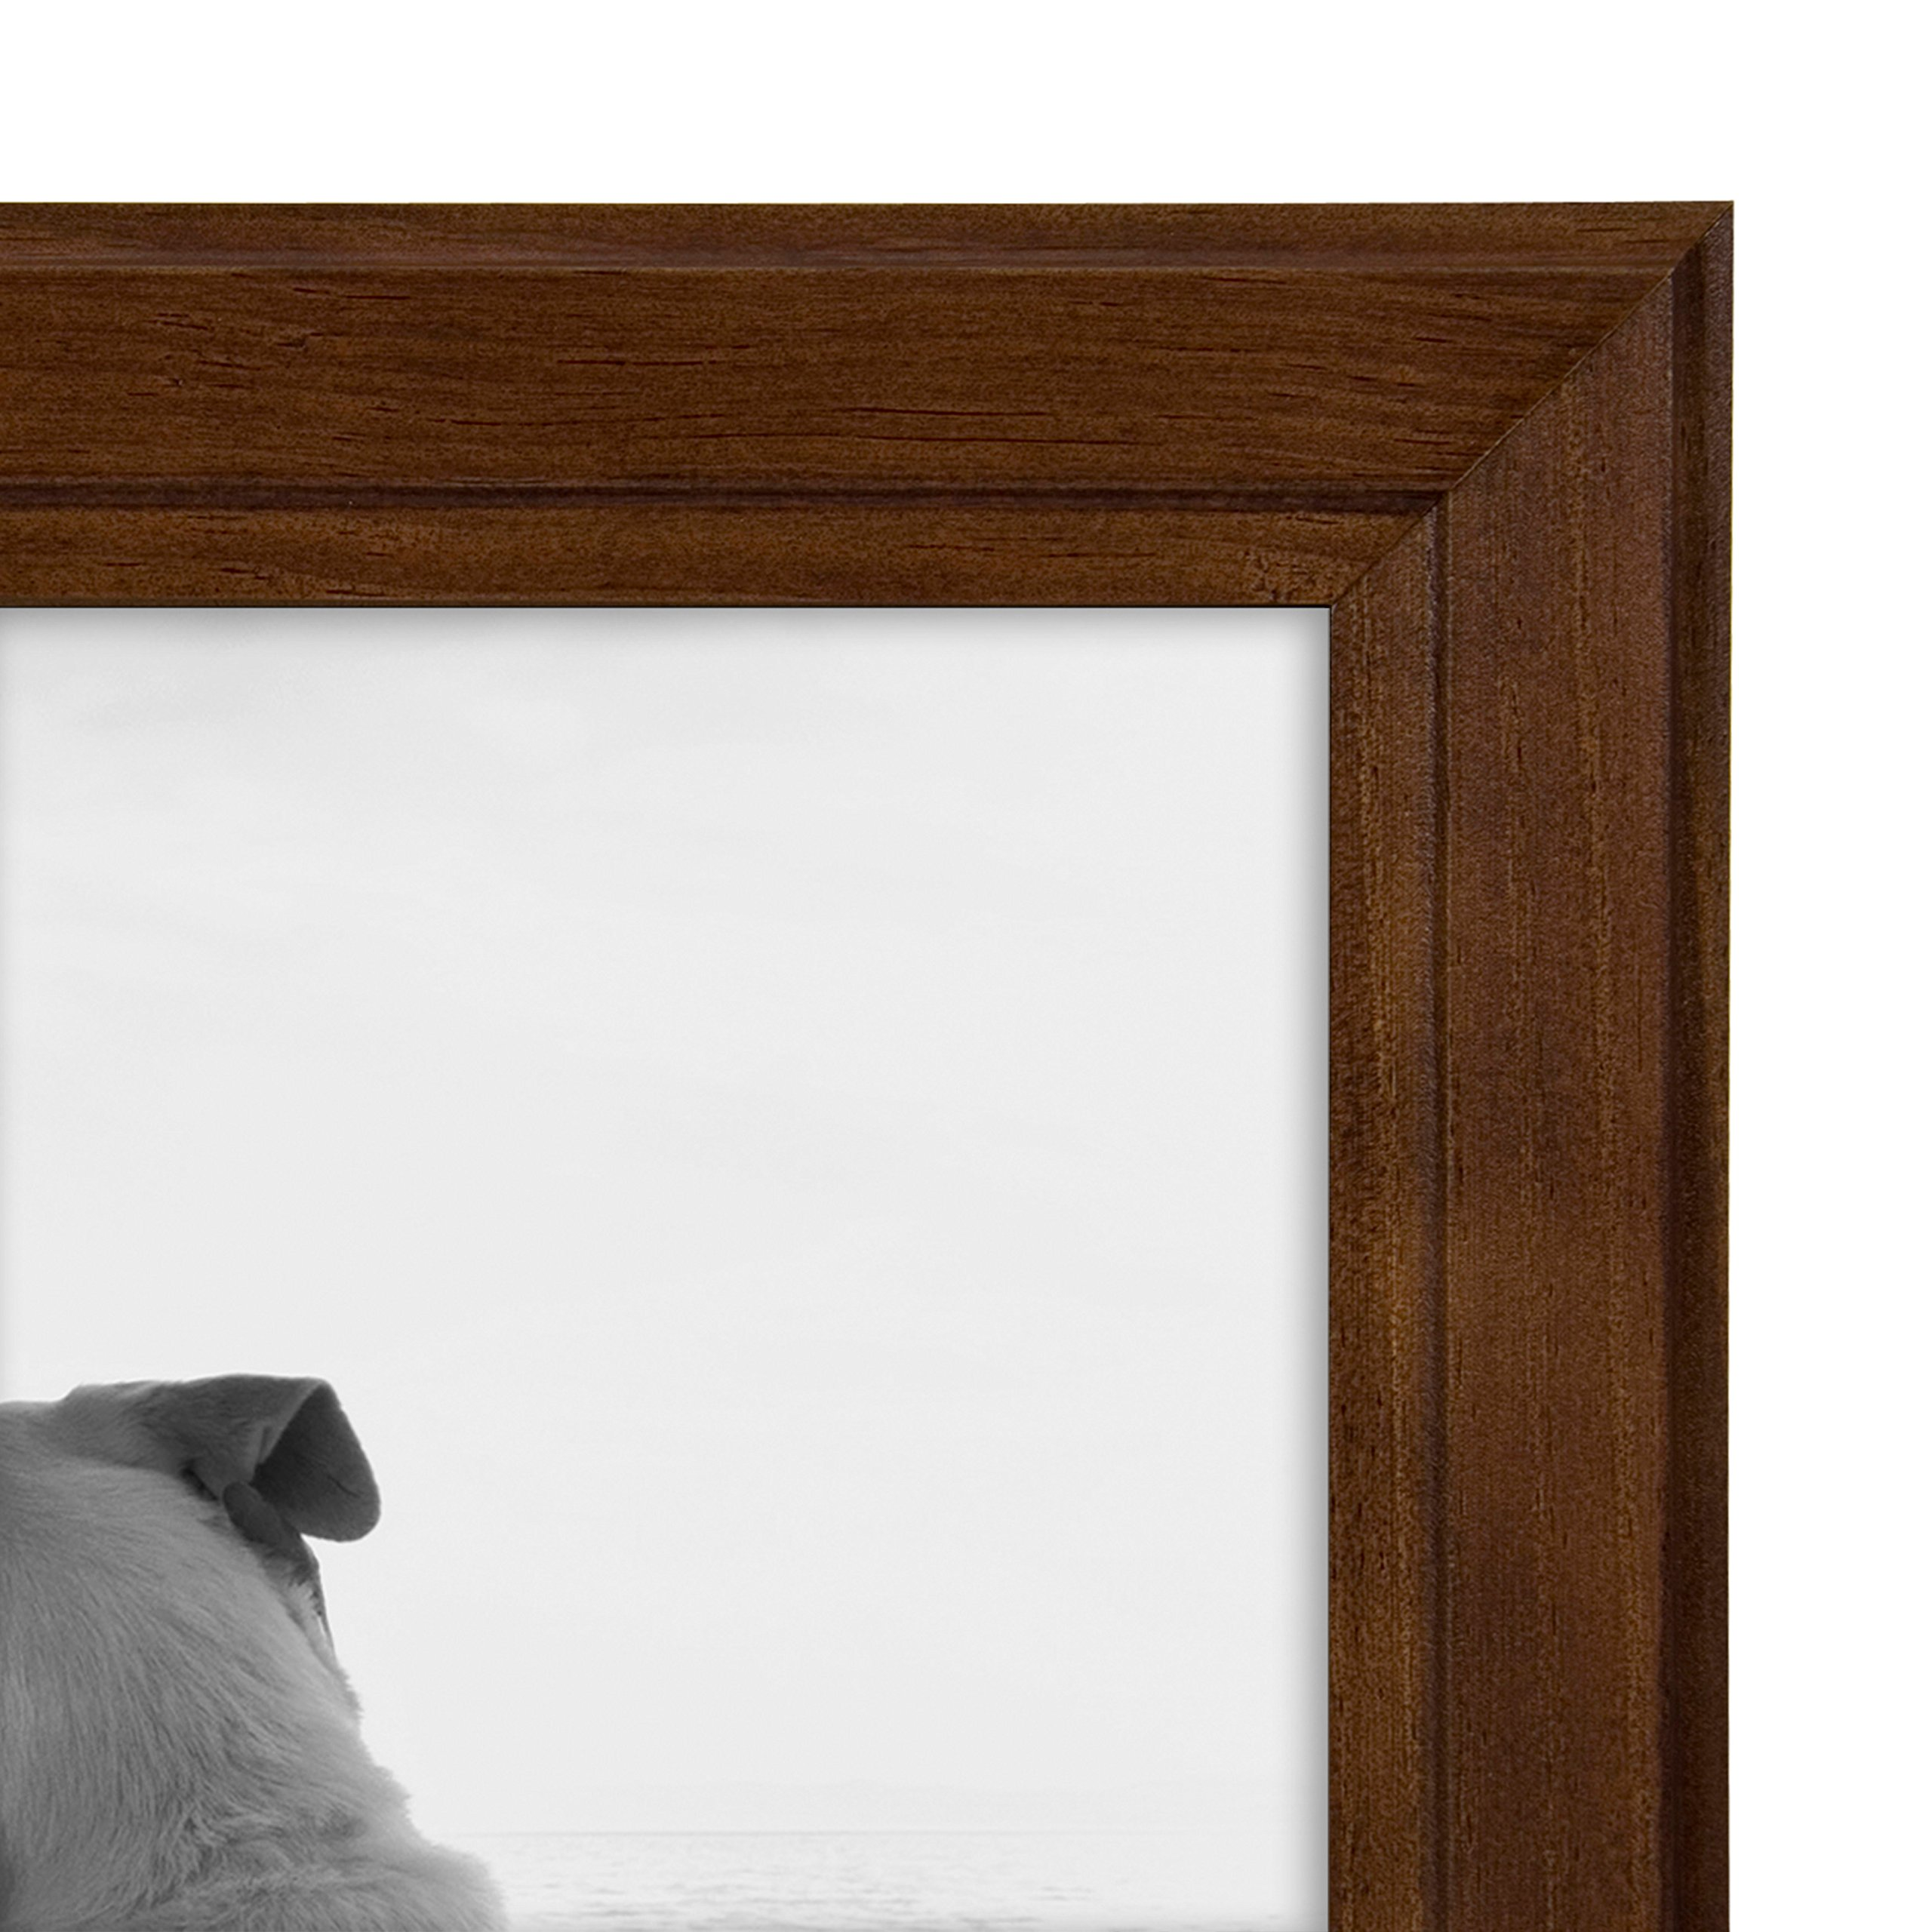 DesignOvation Kieva Solid Wood Picture Frames, Espresso Brown 8x10, Pack of 6 by DesignOvation (Image #4)